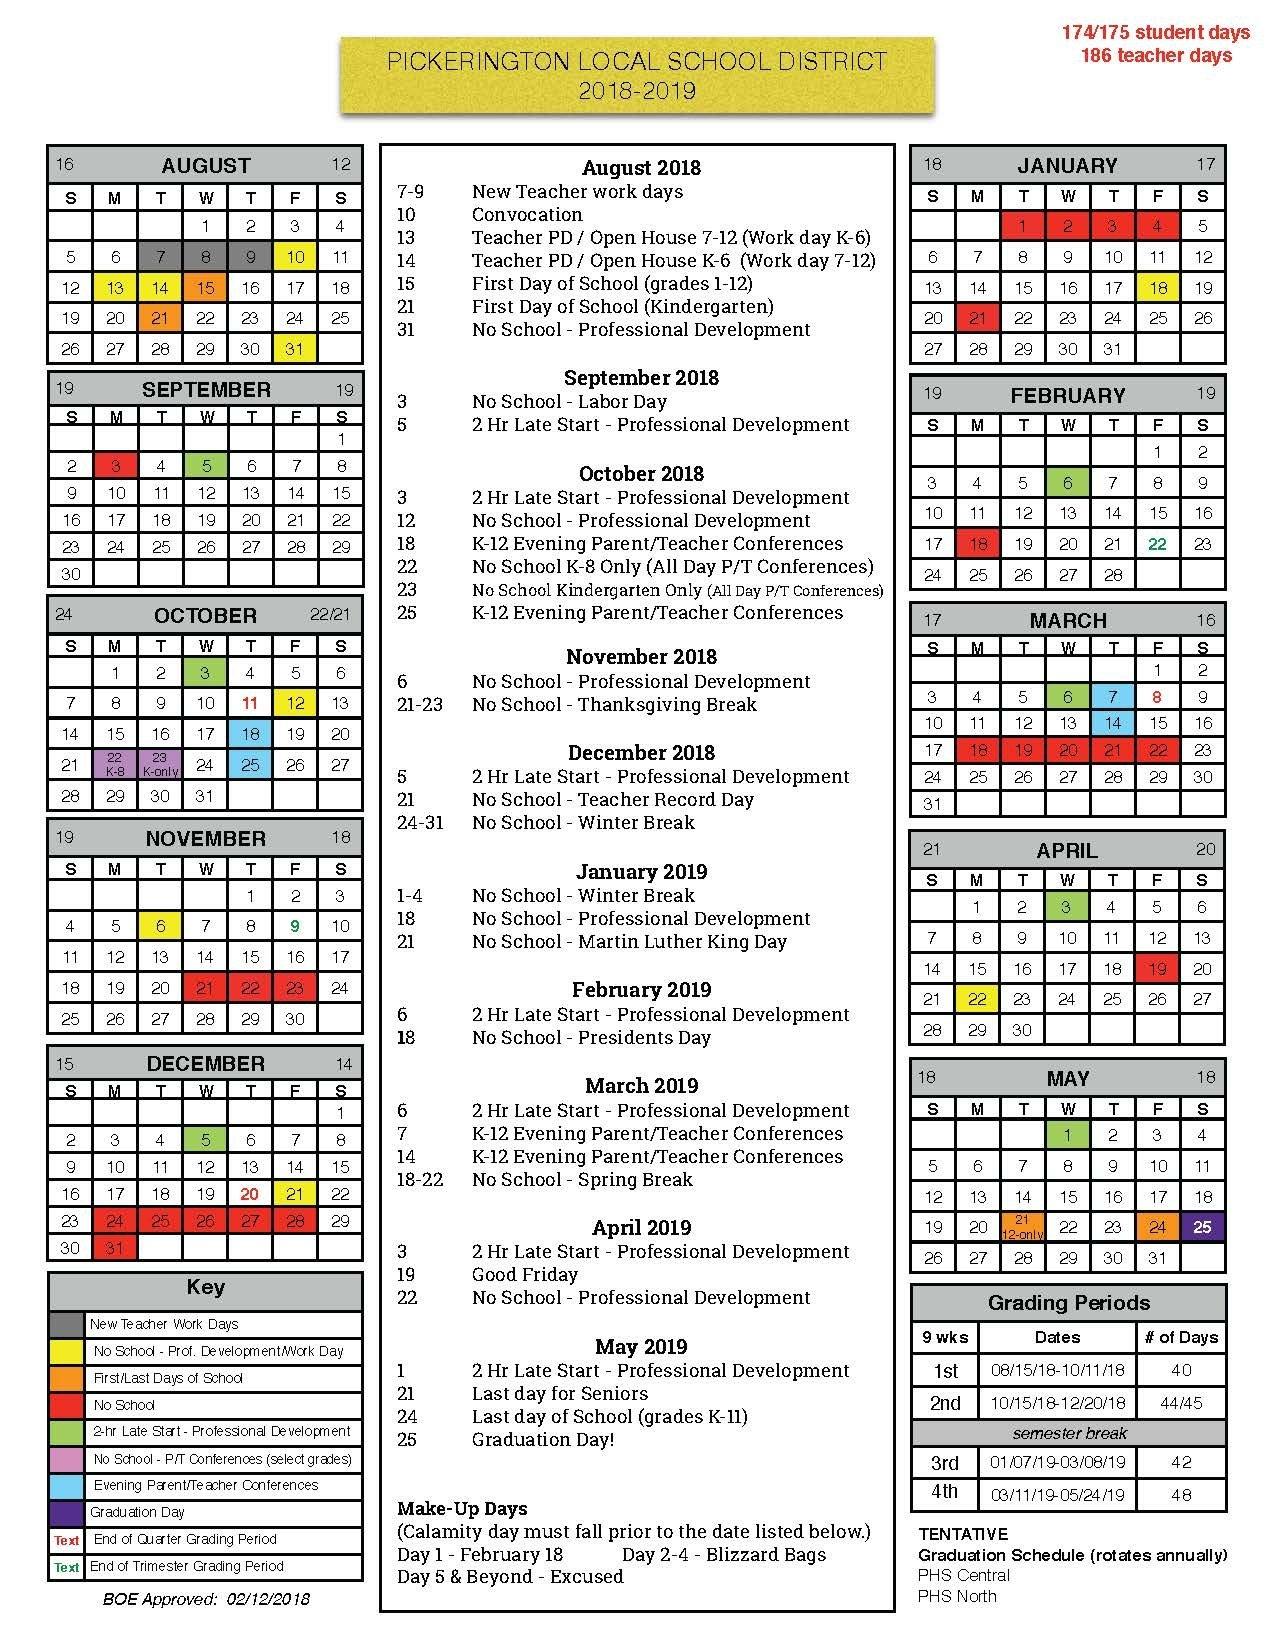 Board Of Education Approves 2018 19 Calendar – Pickerington Local School District 5 Calendar 2019